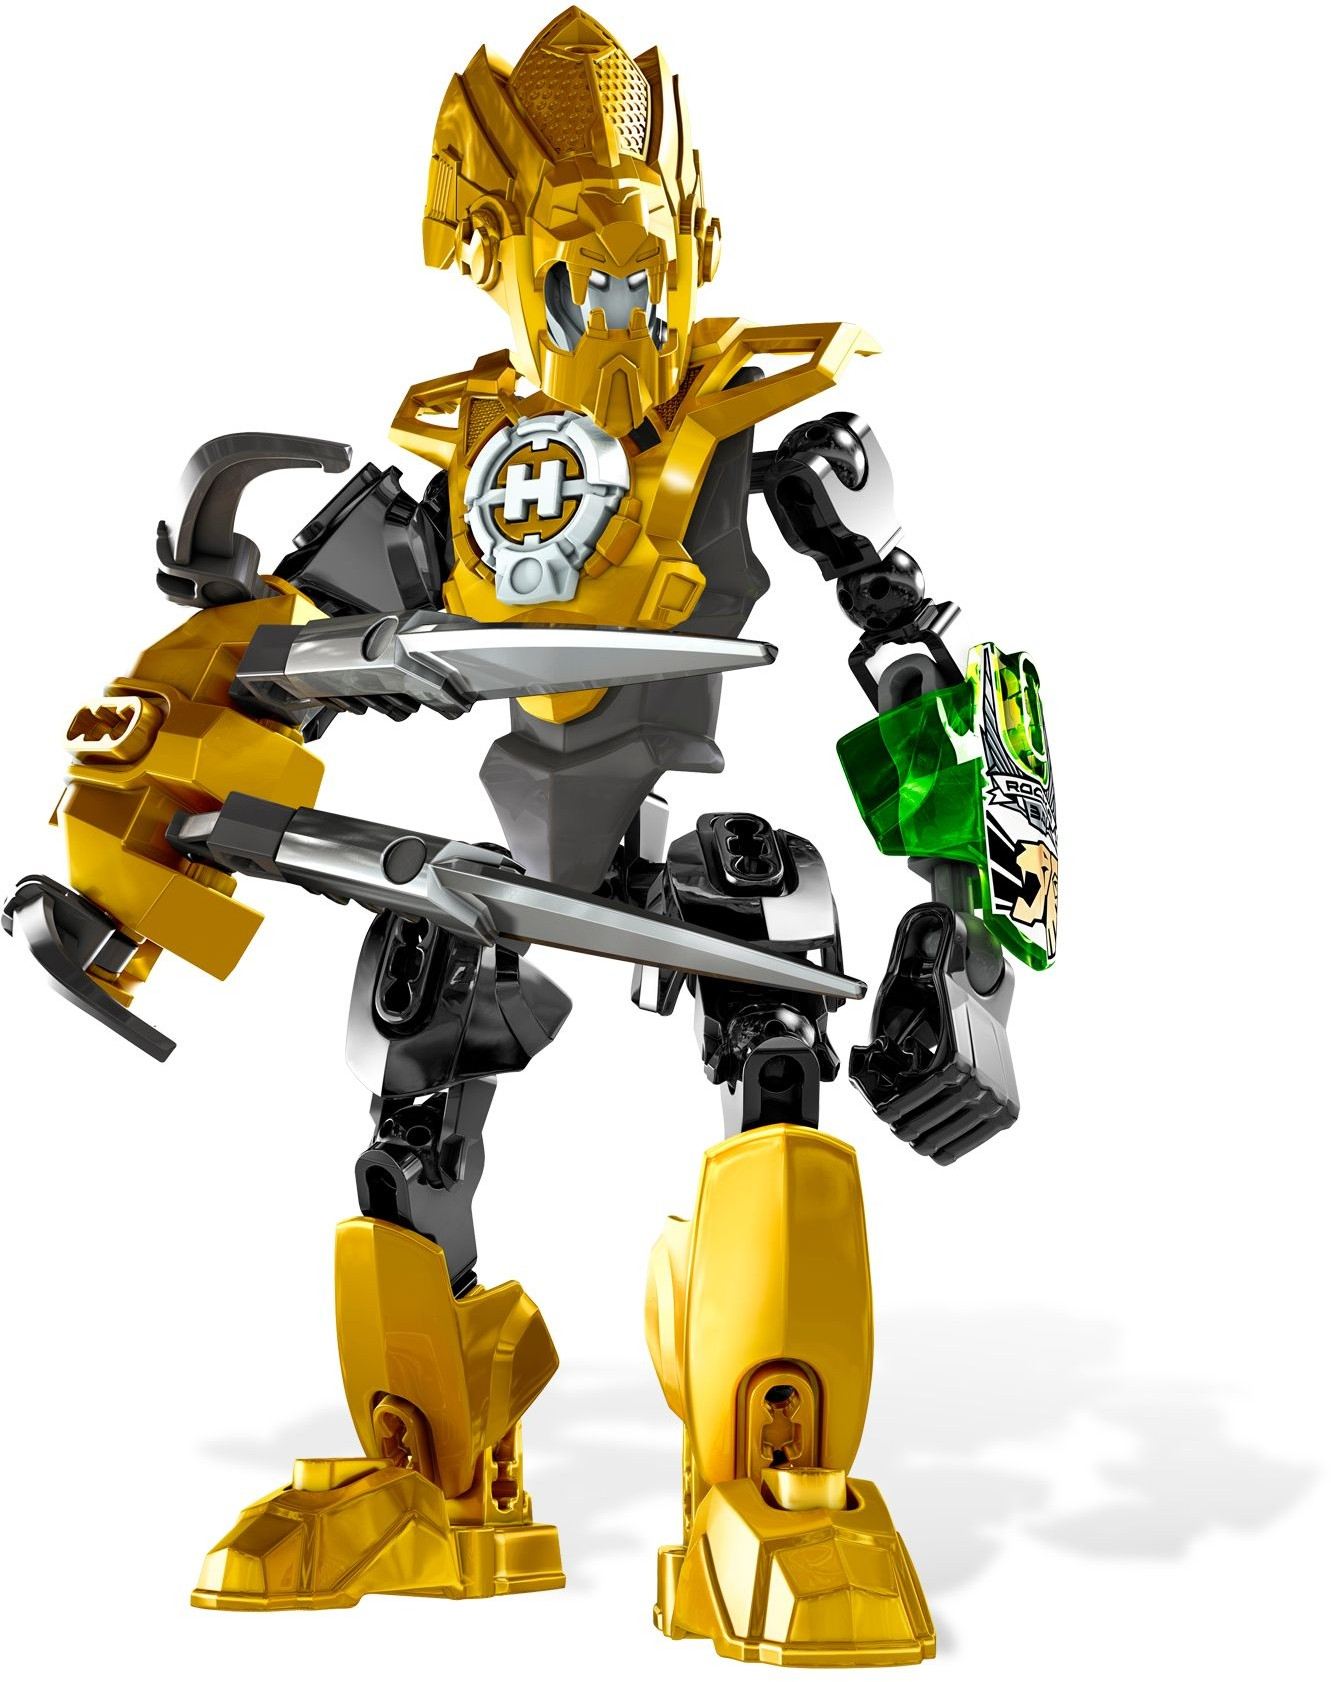 74 Nuevo Genuino Negro Lego Technic studless vigas bloques Conectores Paneles